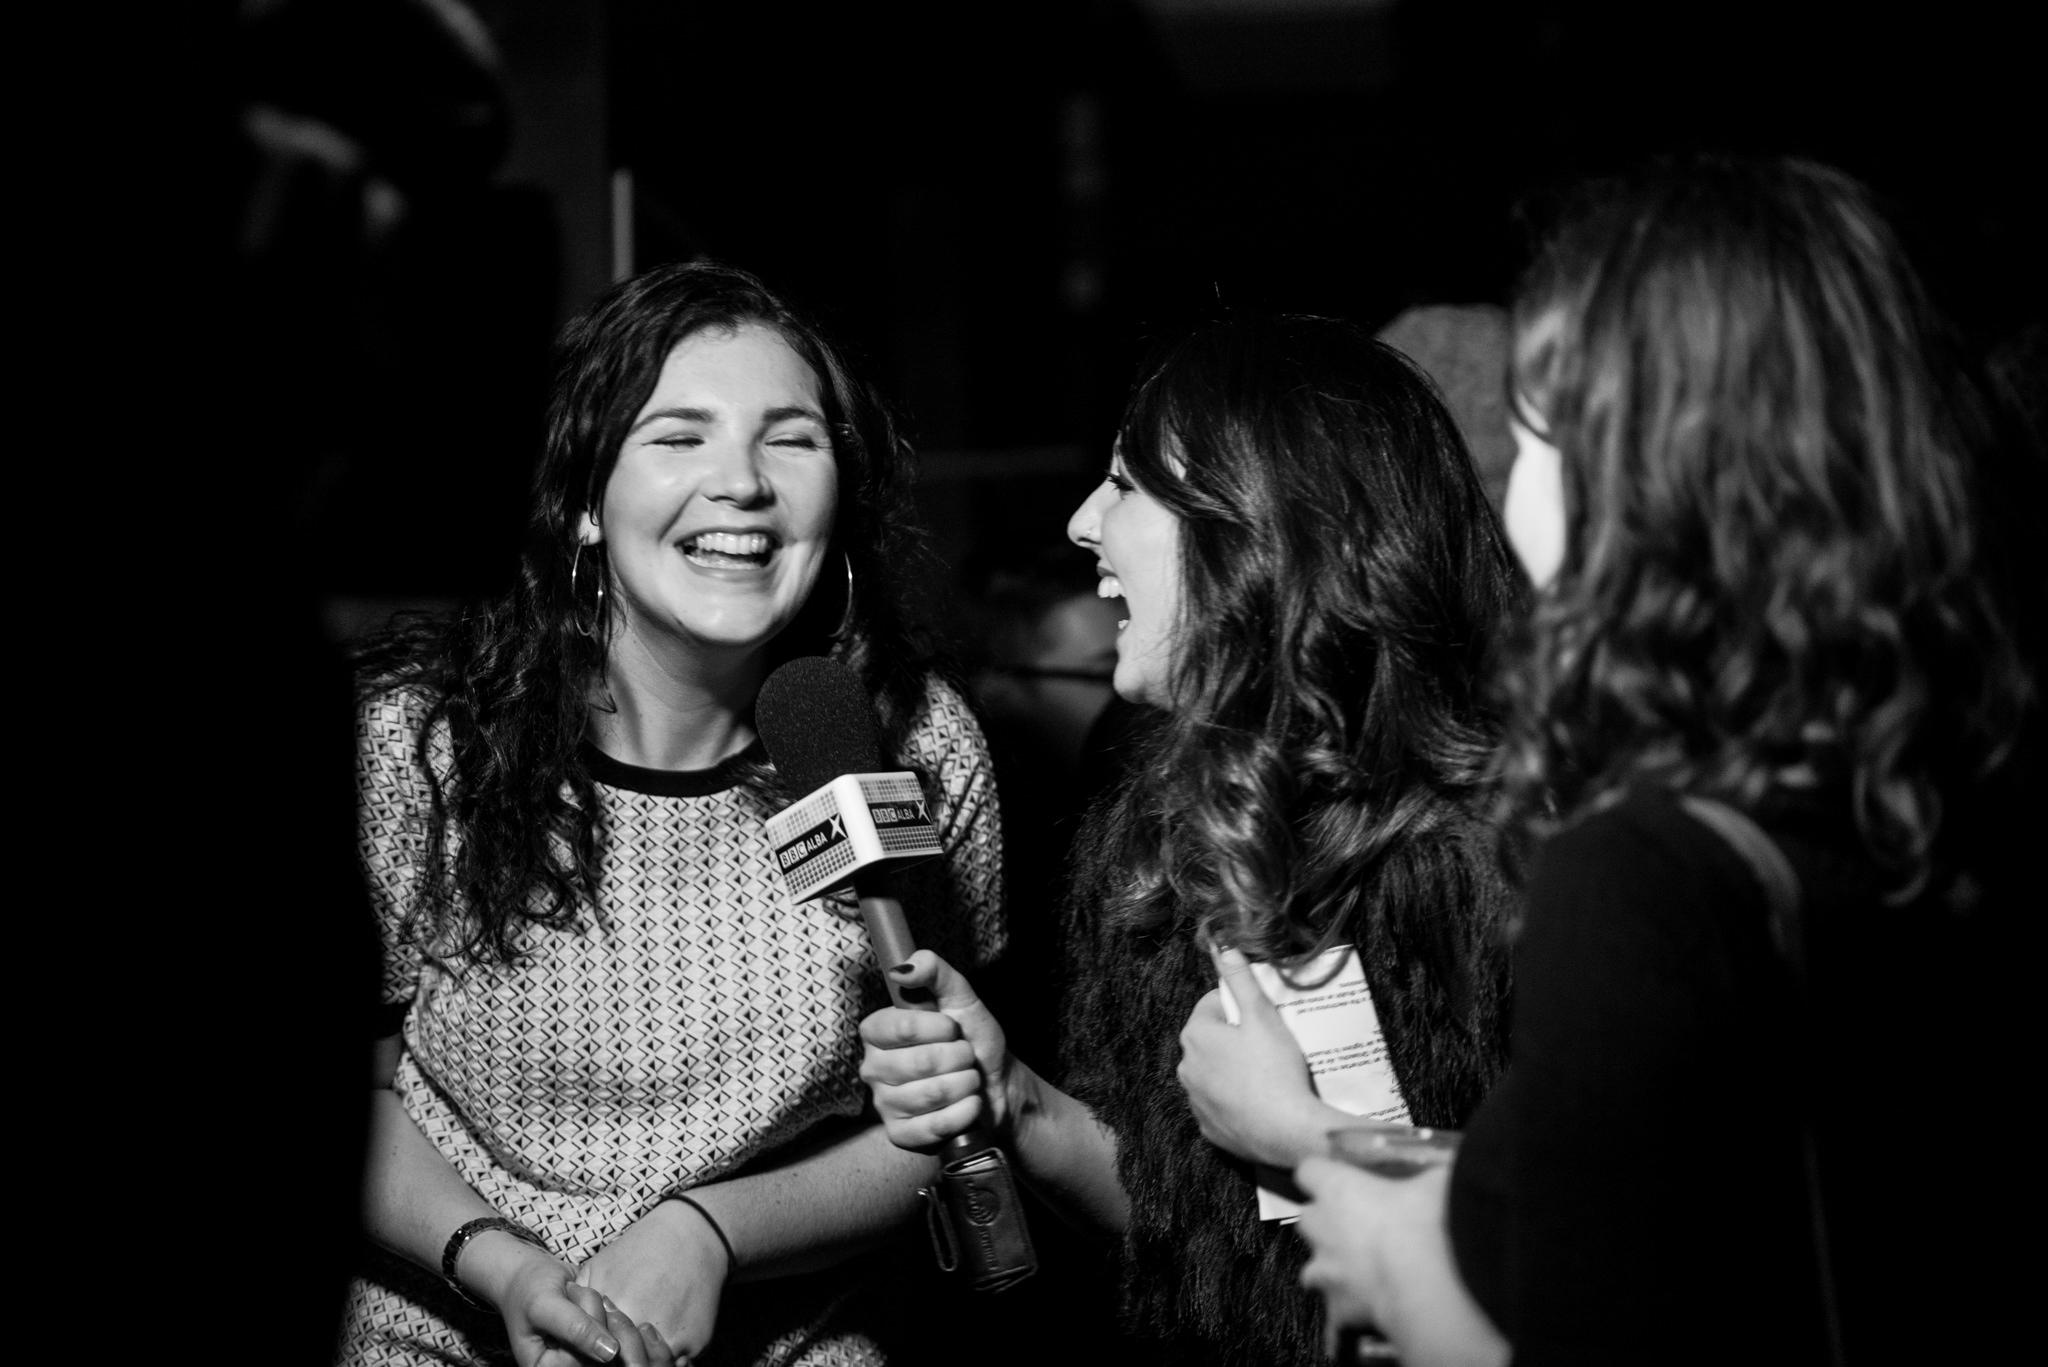 bbc-tv-backstage-recording-interview.jpg